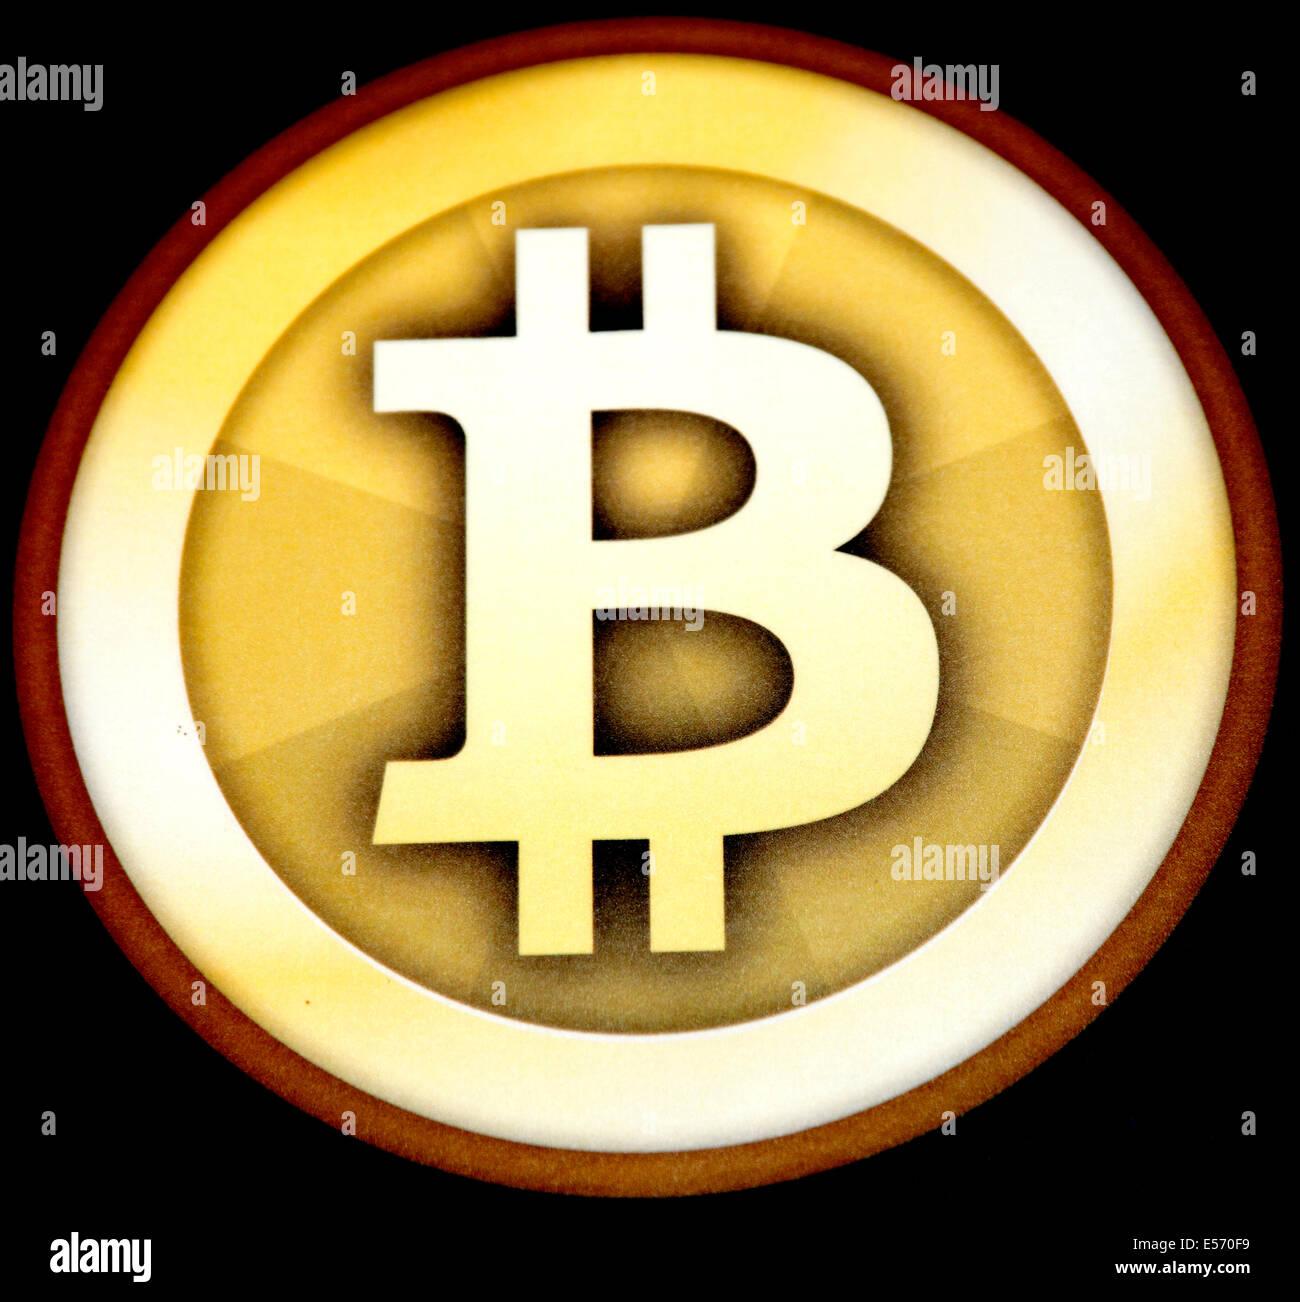 Bitcoin Symbol Stockfotos & Bitcoin Symbol Bilder - Alamy